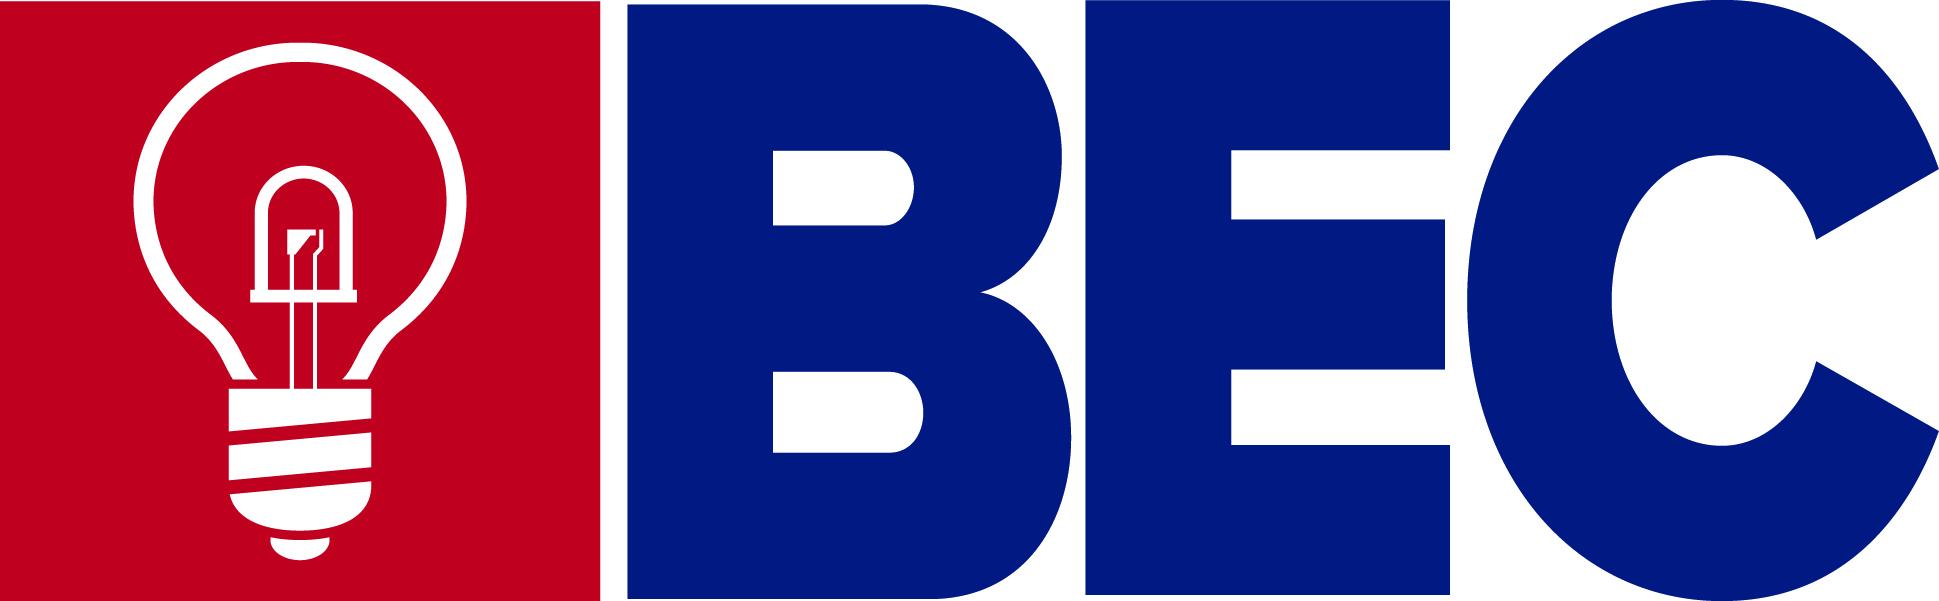 Bandera Electric Cooperative logo